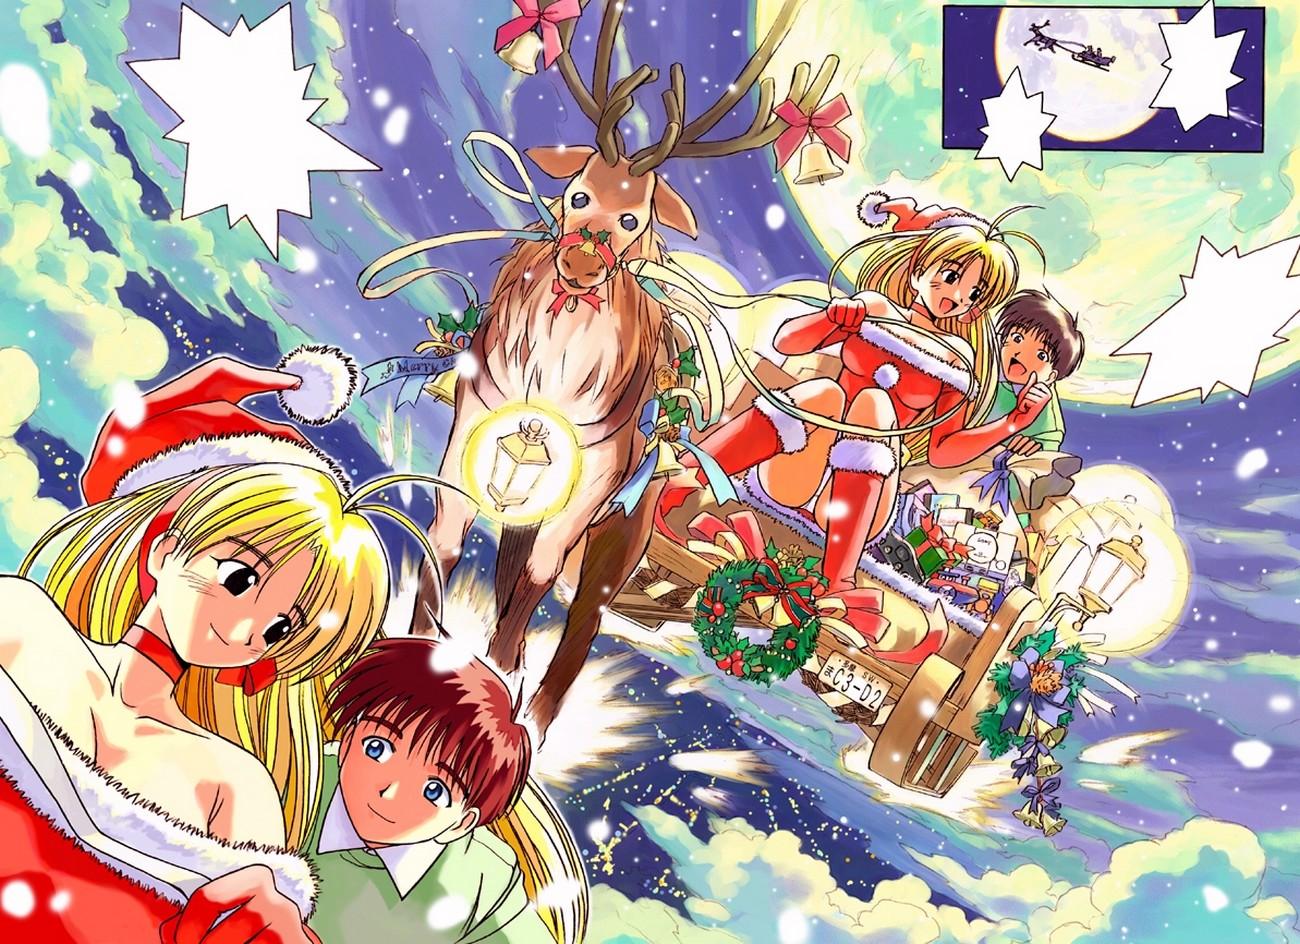 https://seriousmoe.files.wordpress.com/2009/12/minitokyo-itsudatte-my-santa-scans_400992.jpg